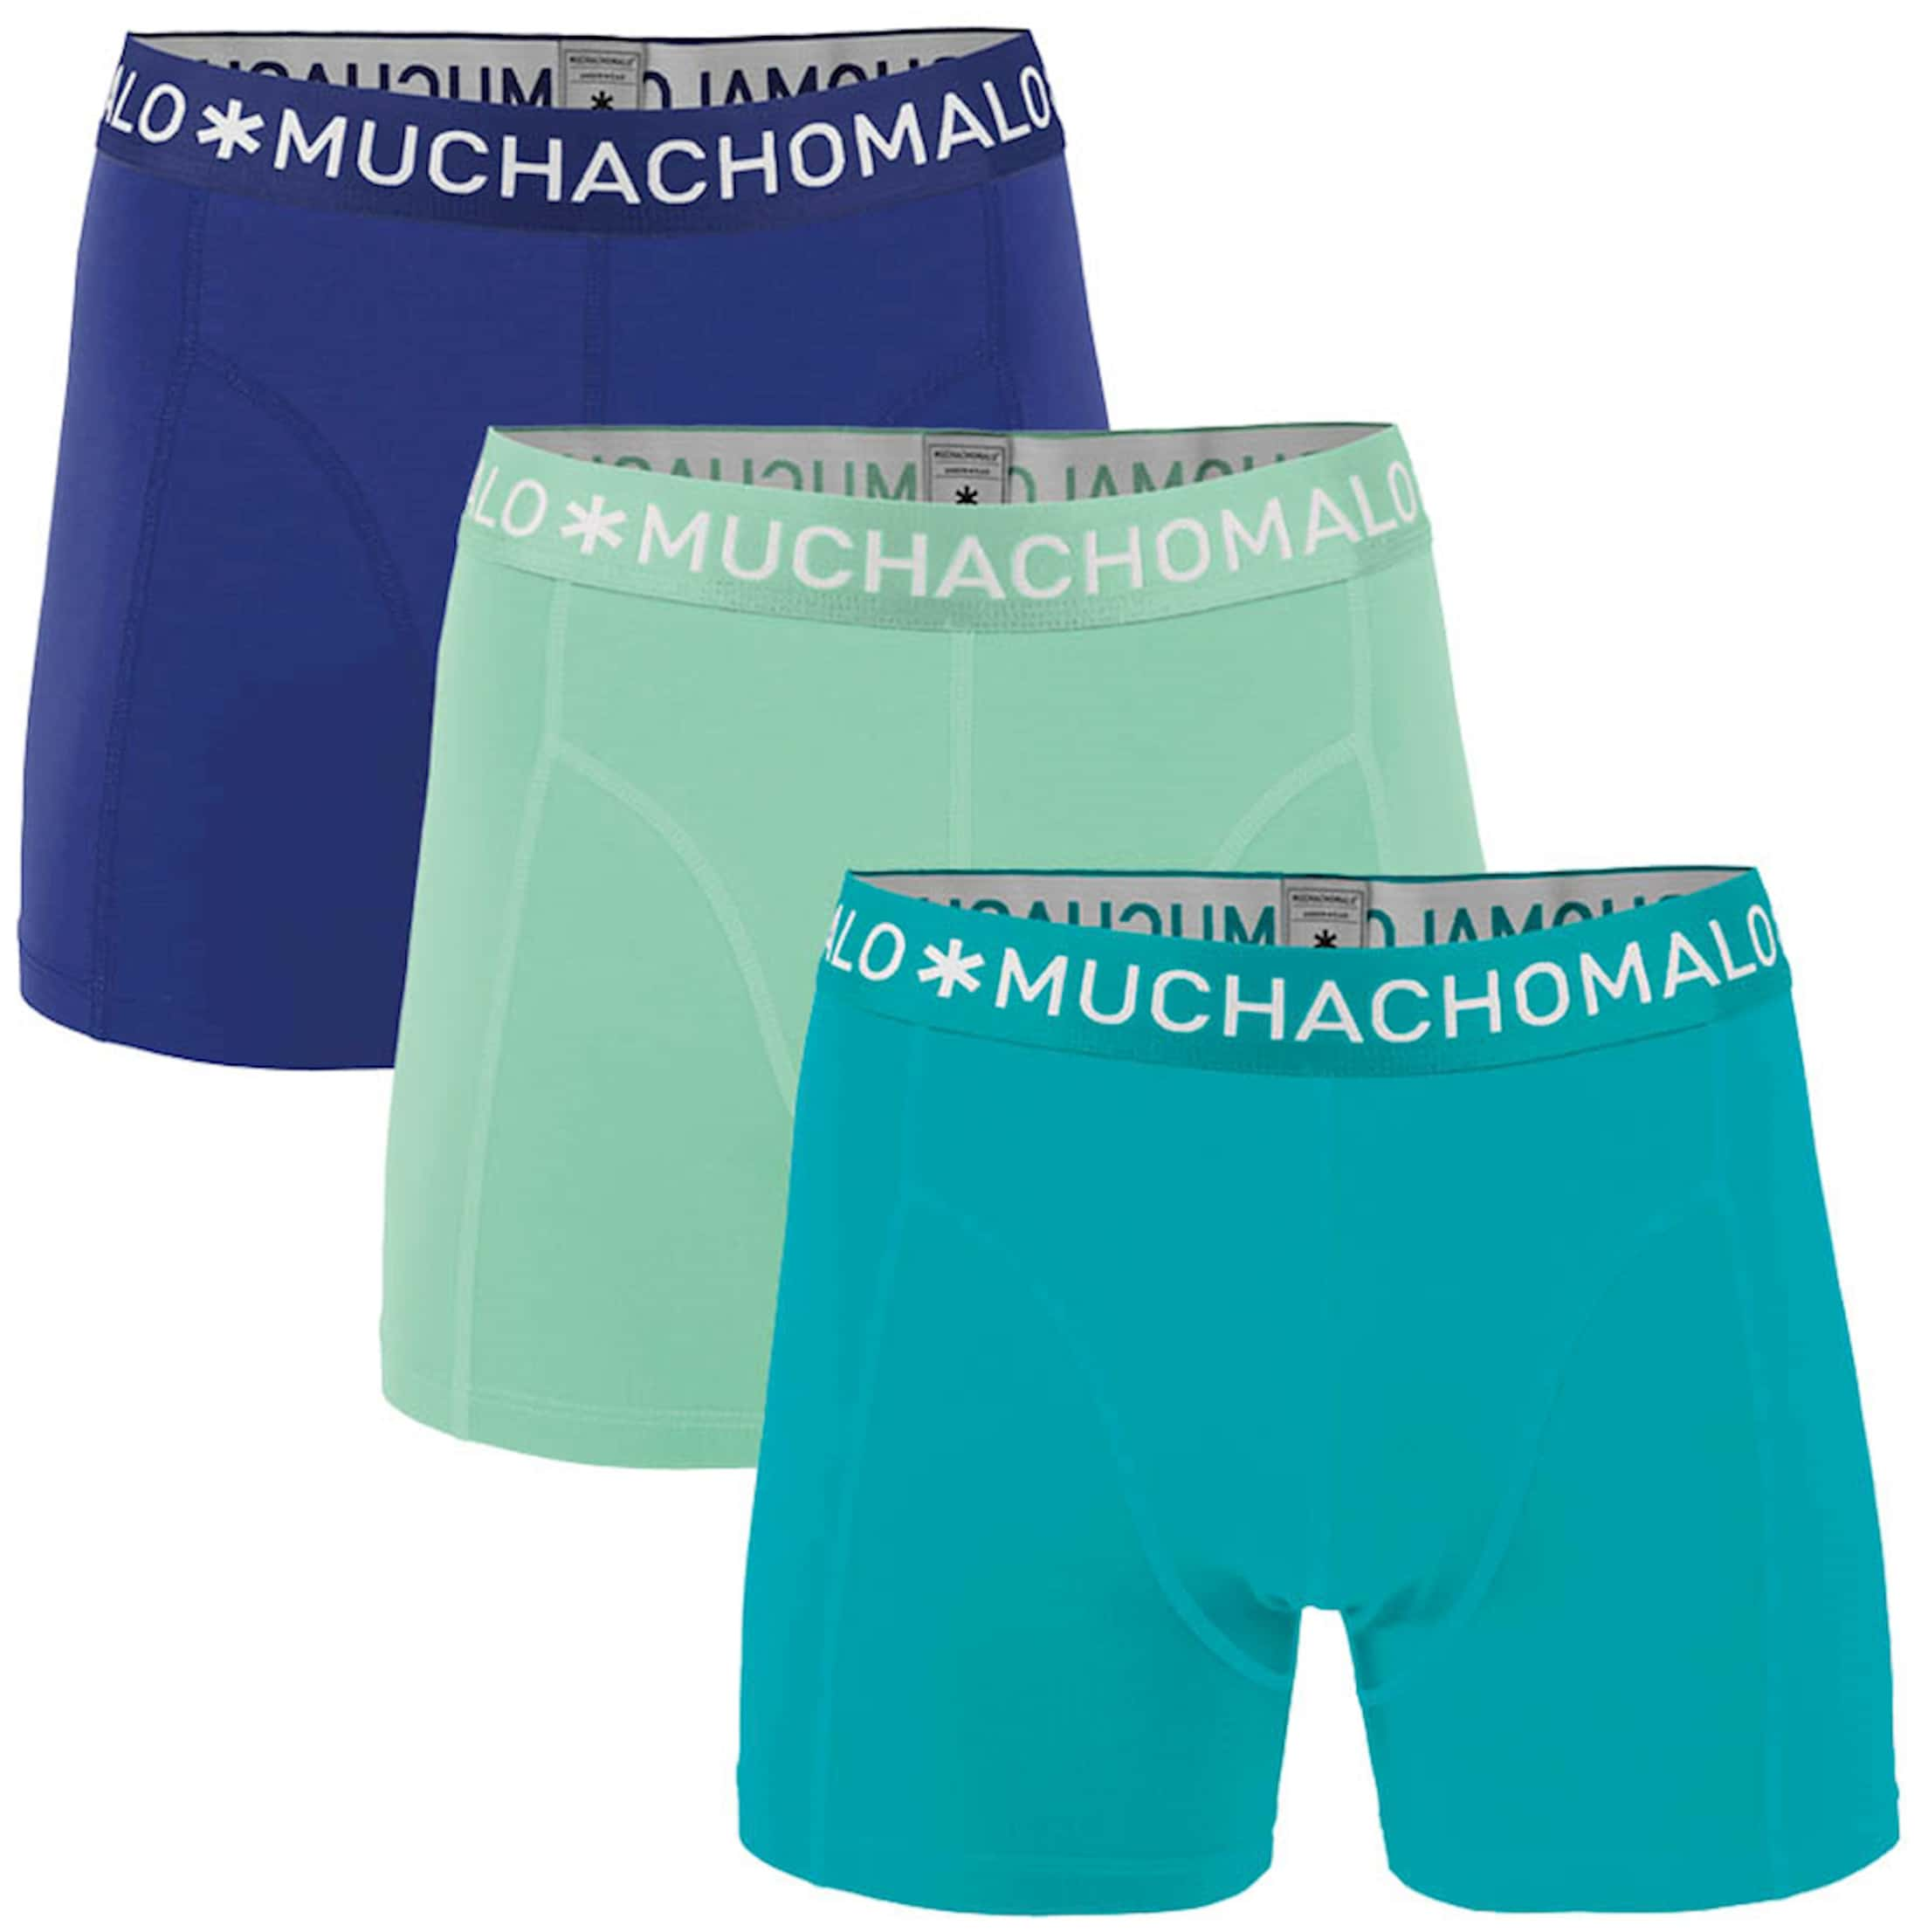 Muchachomalo Boxershorts 3-Pack 282 foto 0